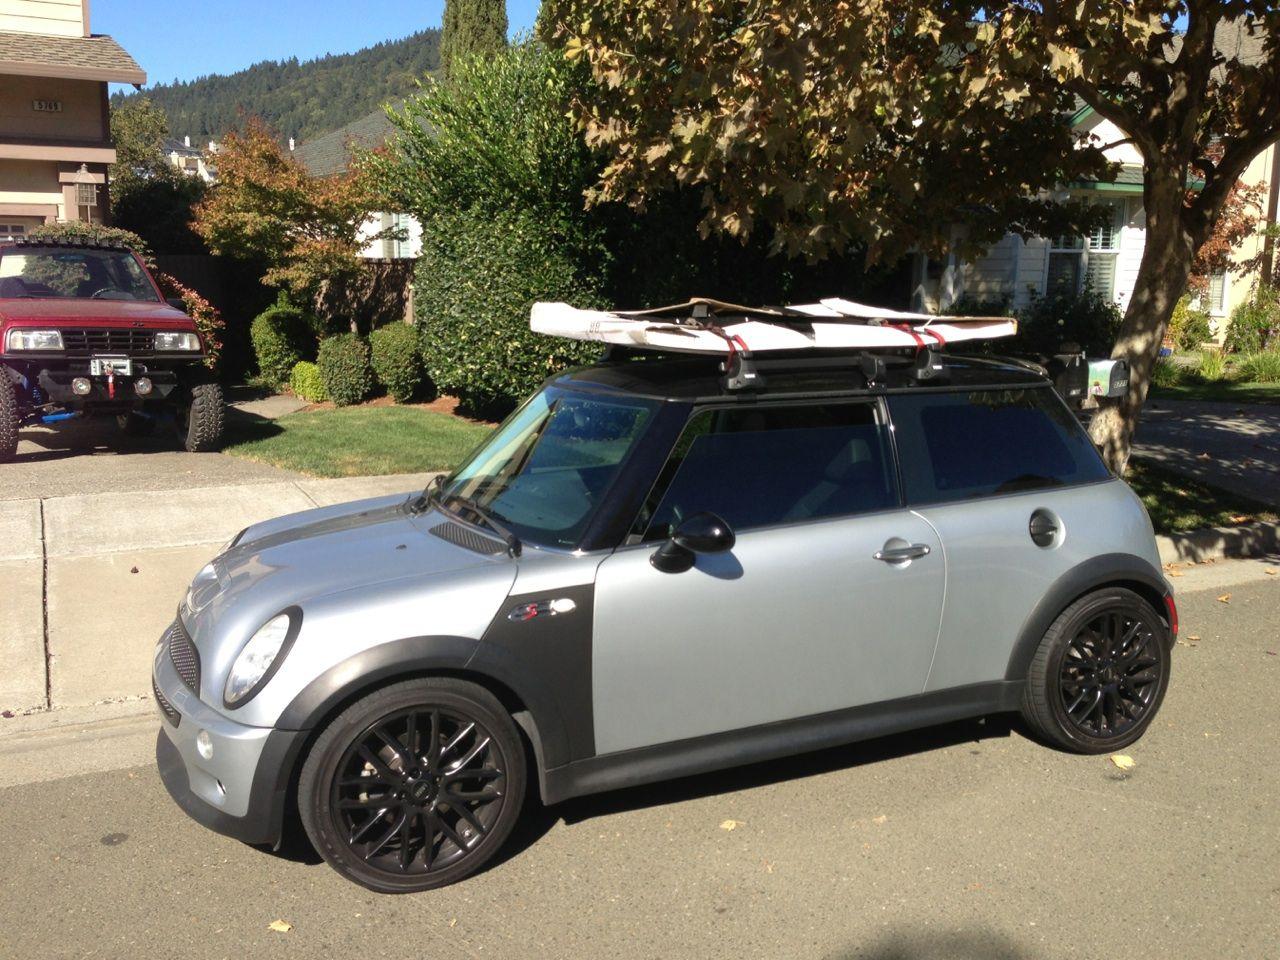 Mini Cooper S Roof Rack Use The Garage Cooper Countryman Mini